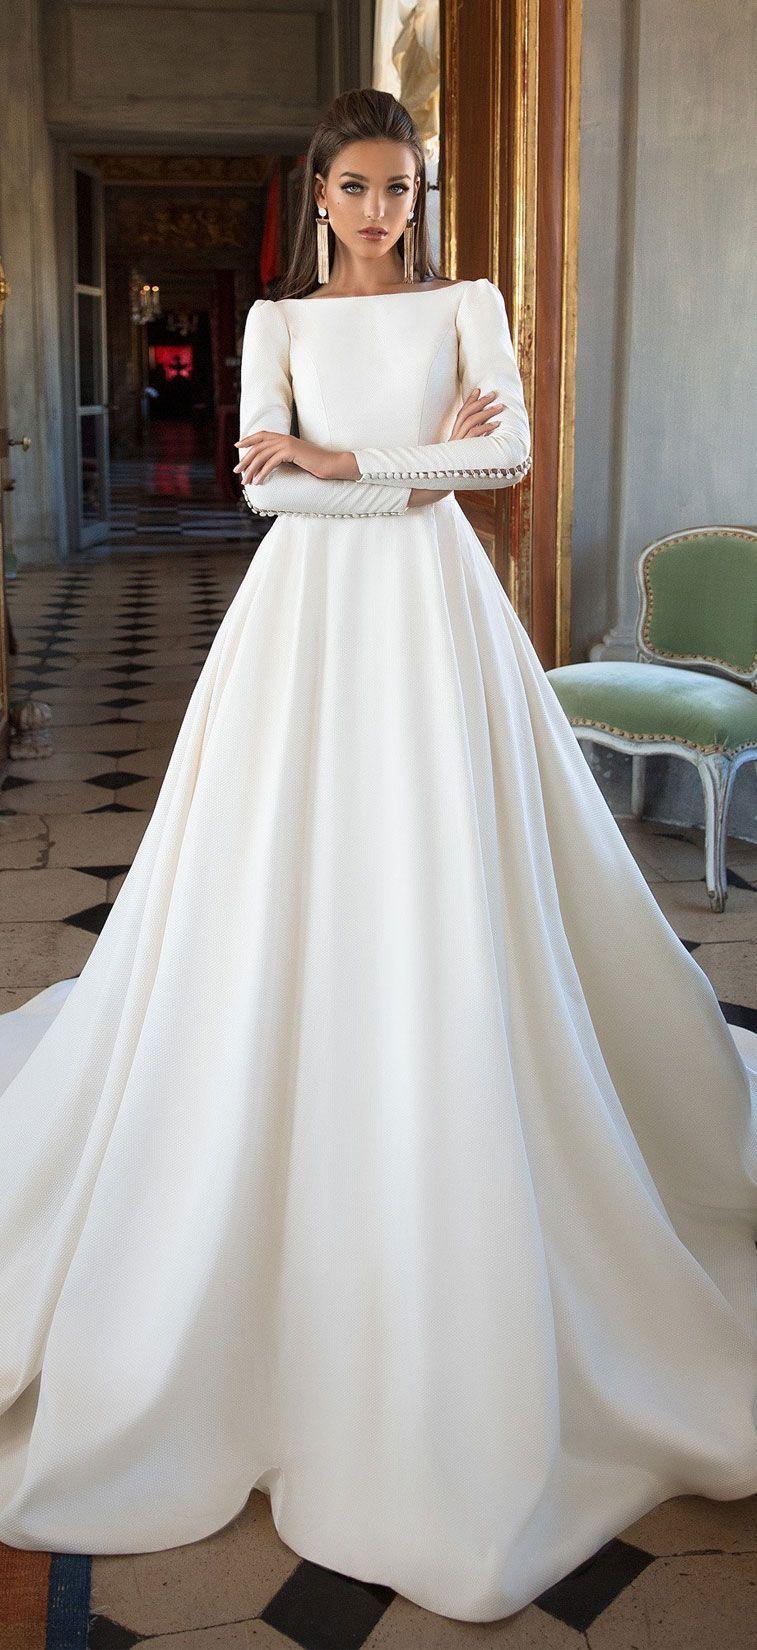 Long sleeves simple a line wedding dress Milla Nova